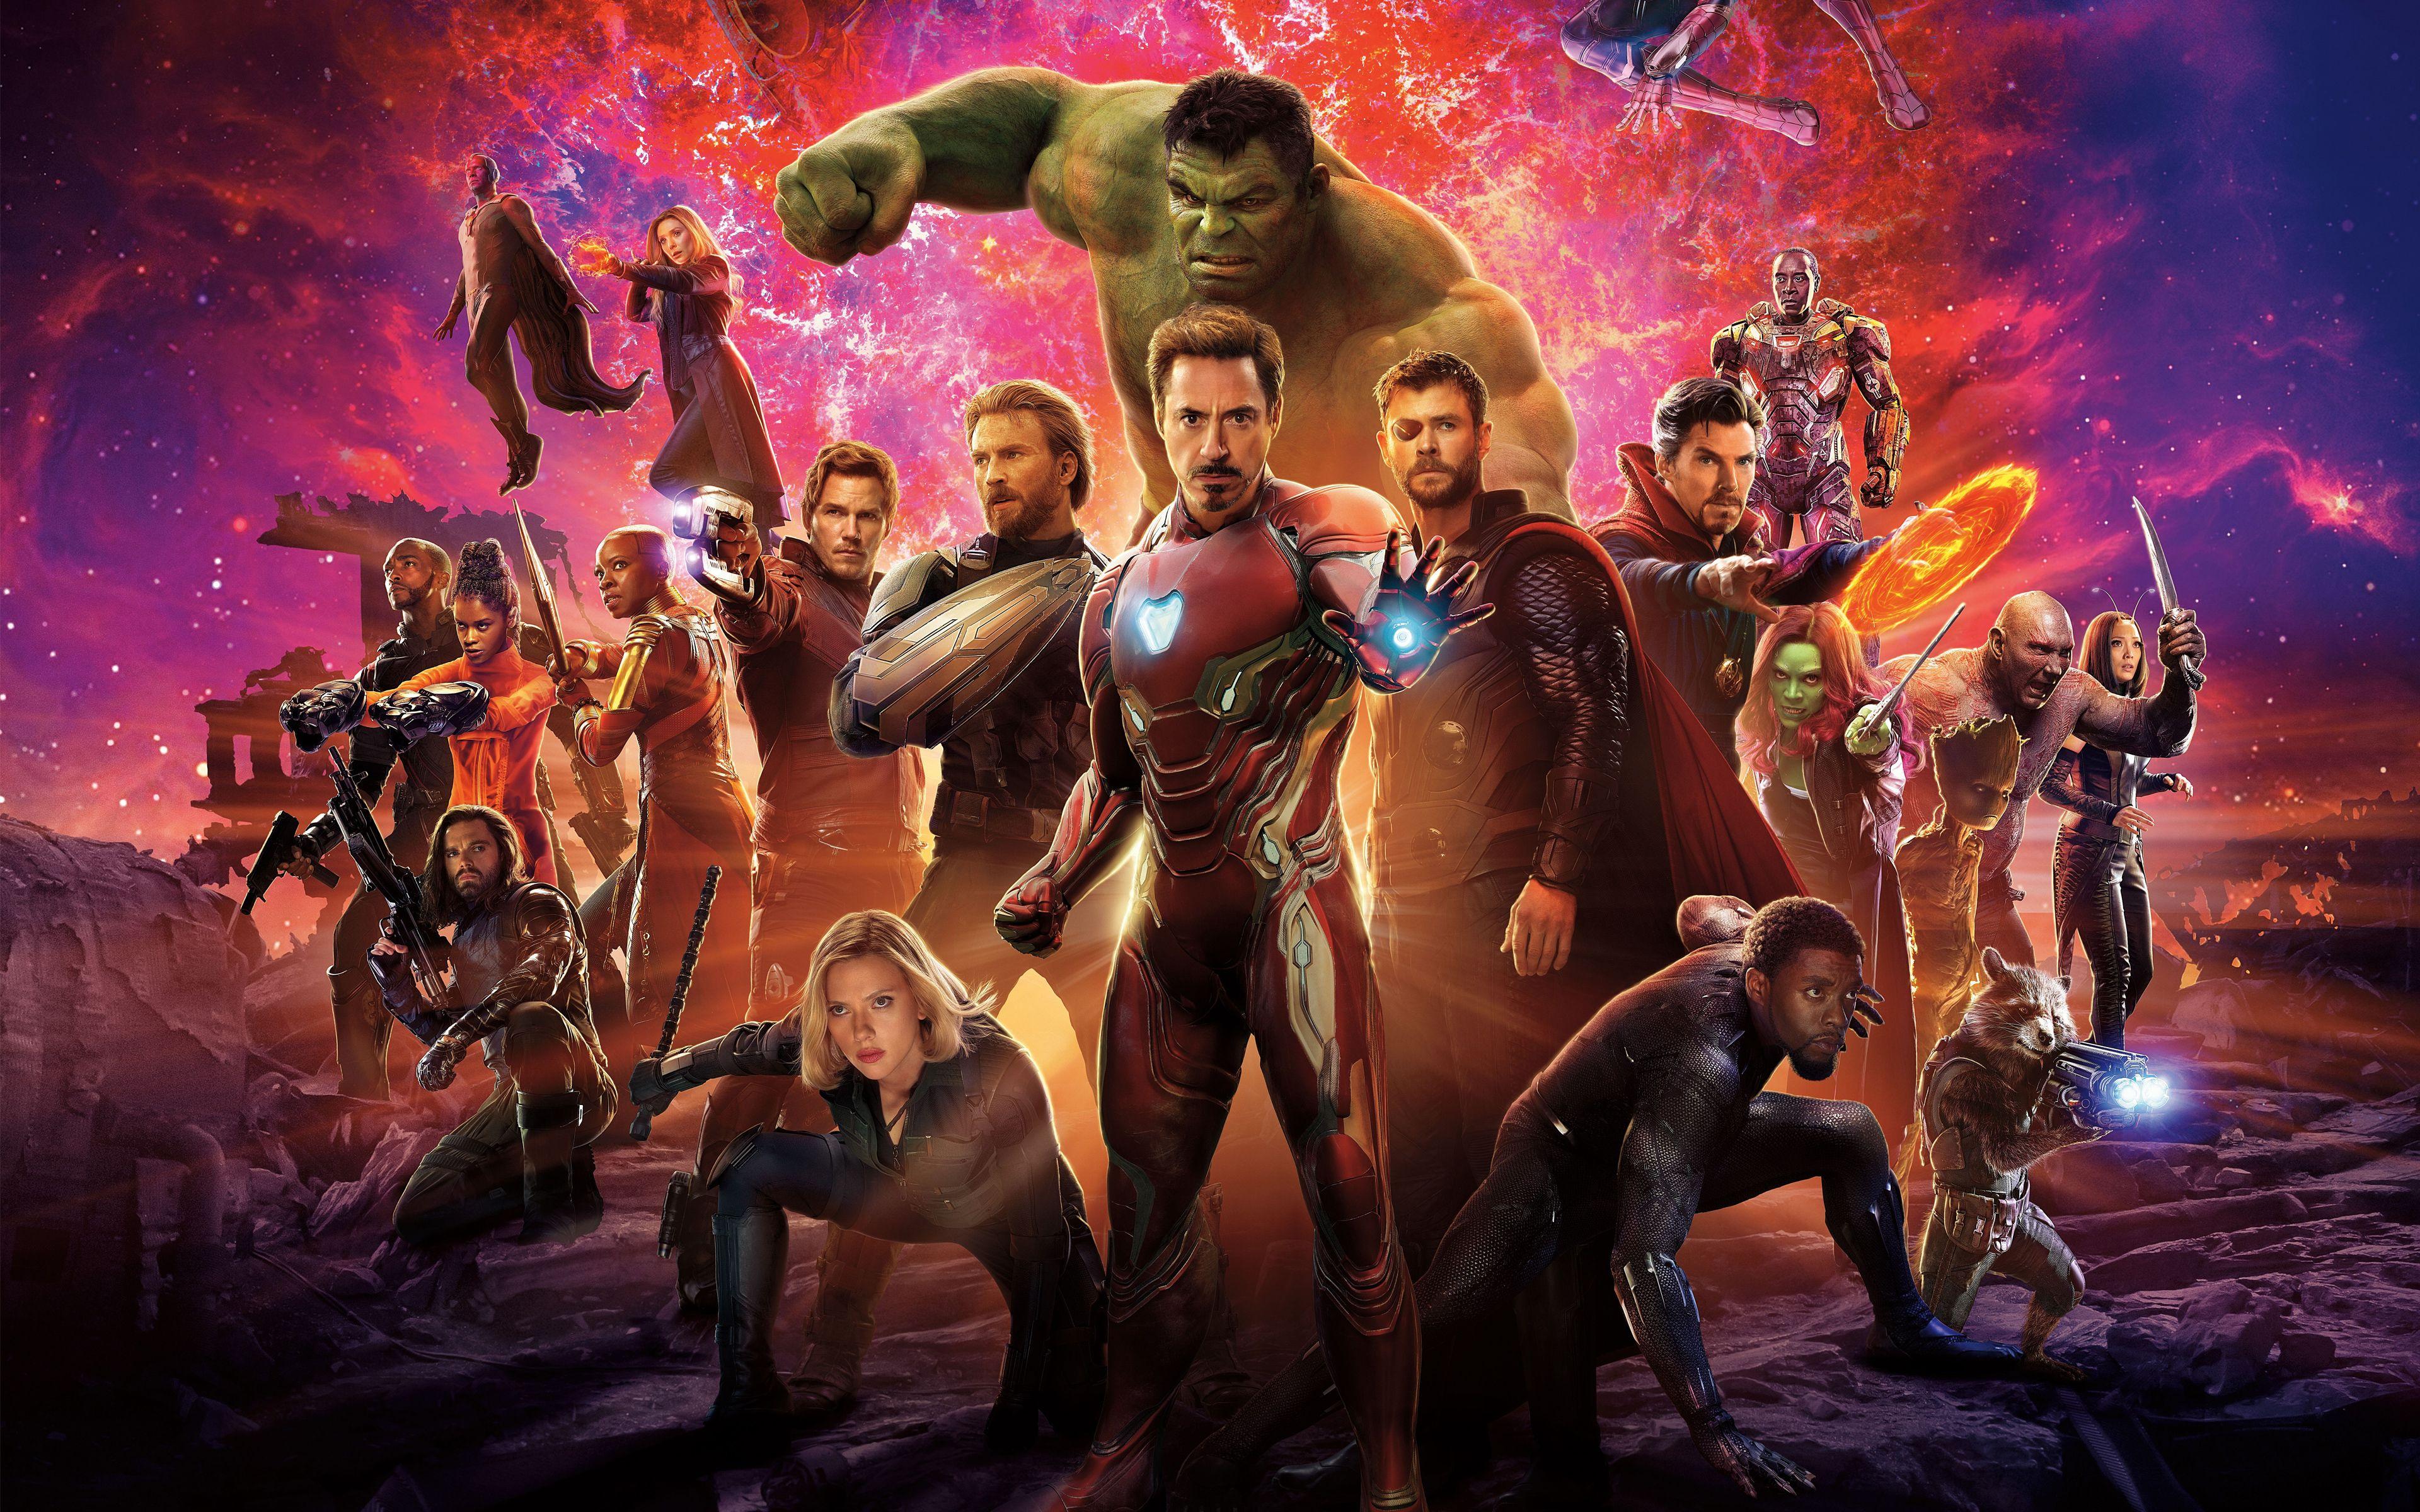 Avengers: Infinity War 4K Wallpapers - Wallpaper Cave